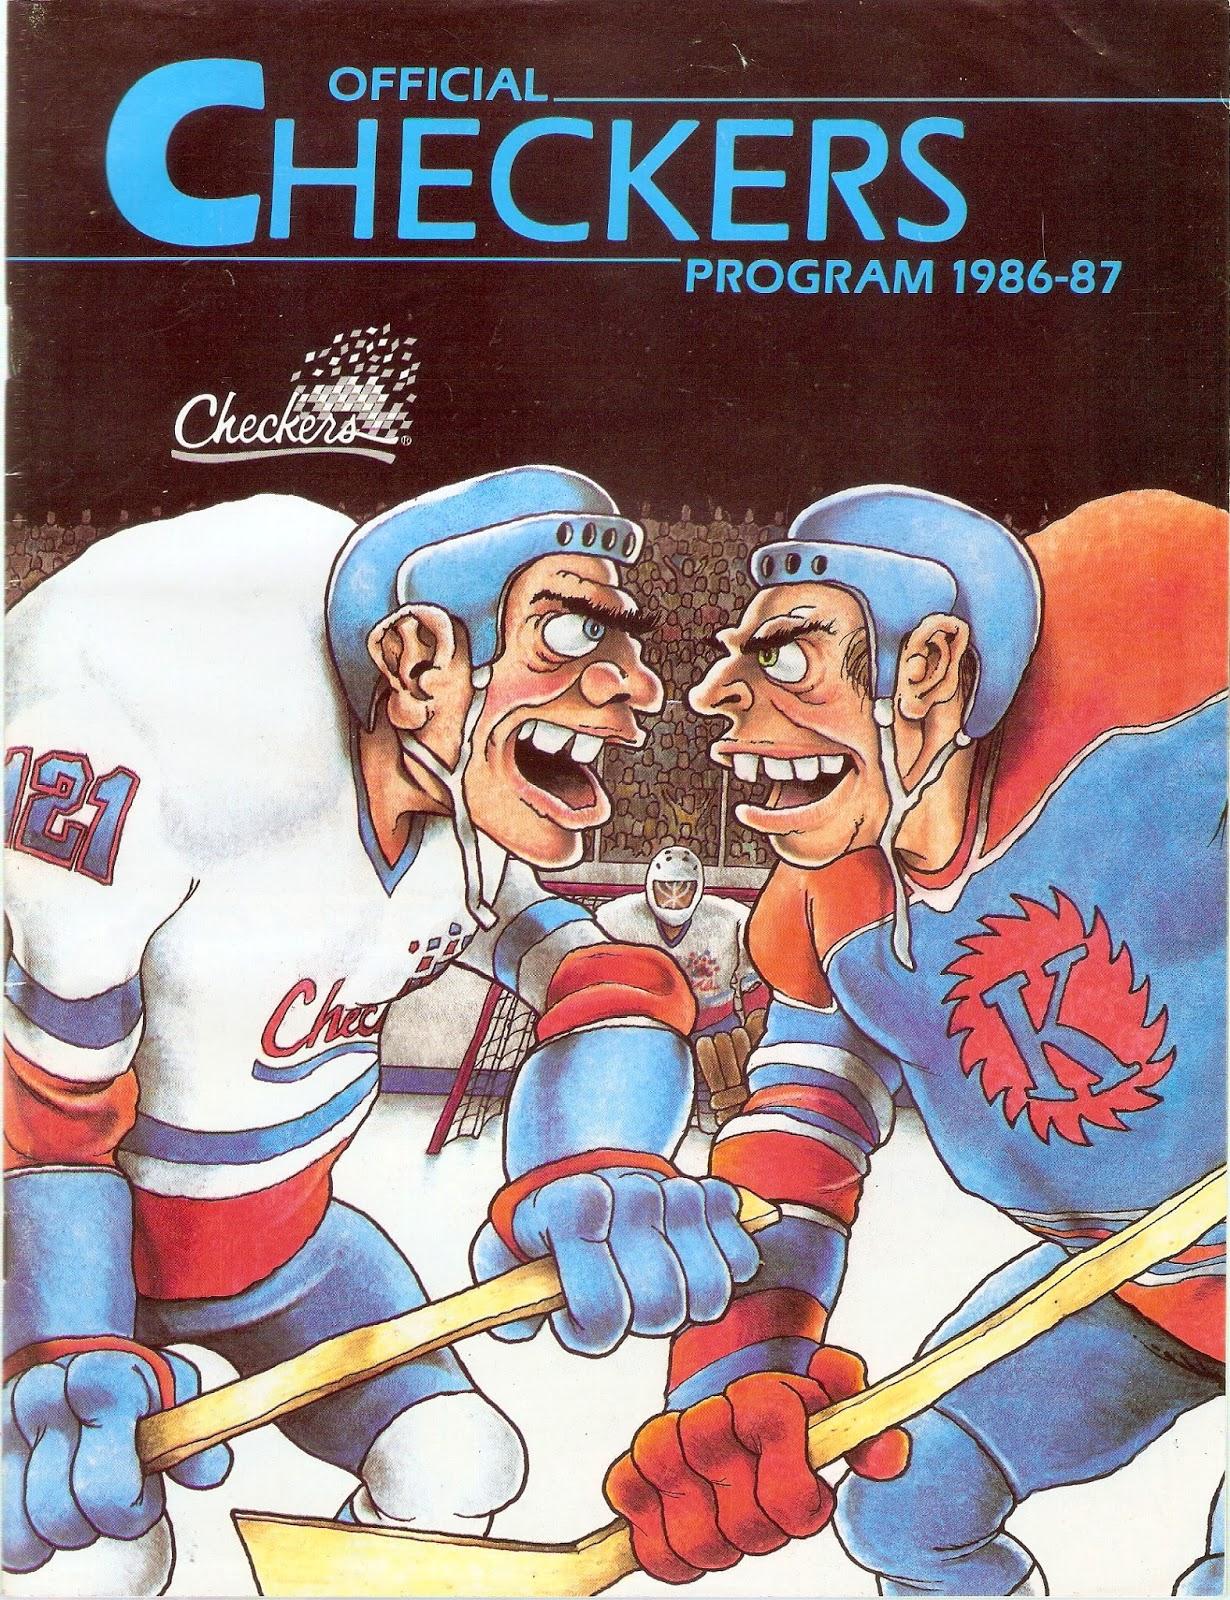 Hockey Programs: Indianapolis Checkers (IHL, 1986-87)